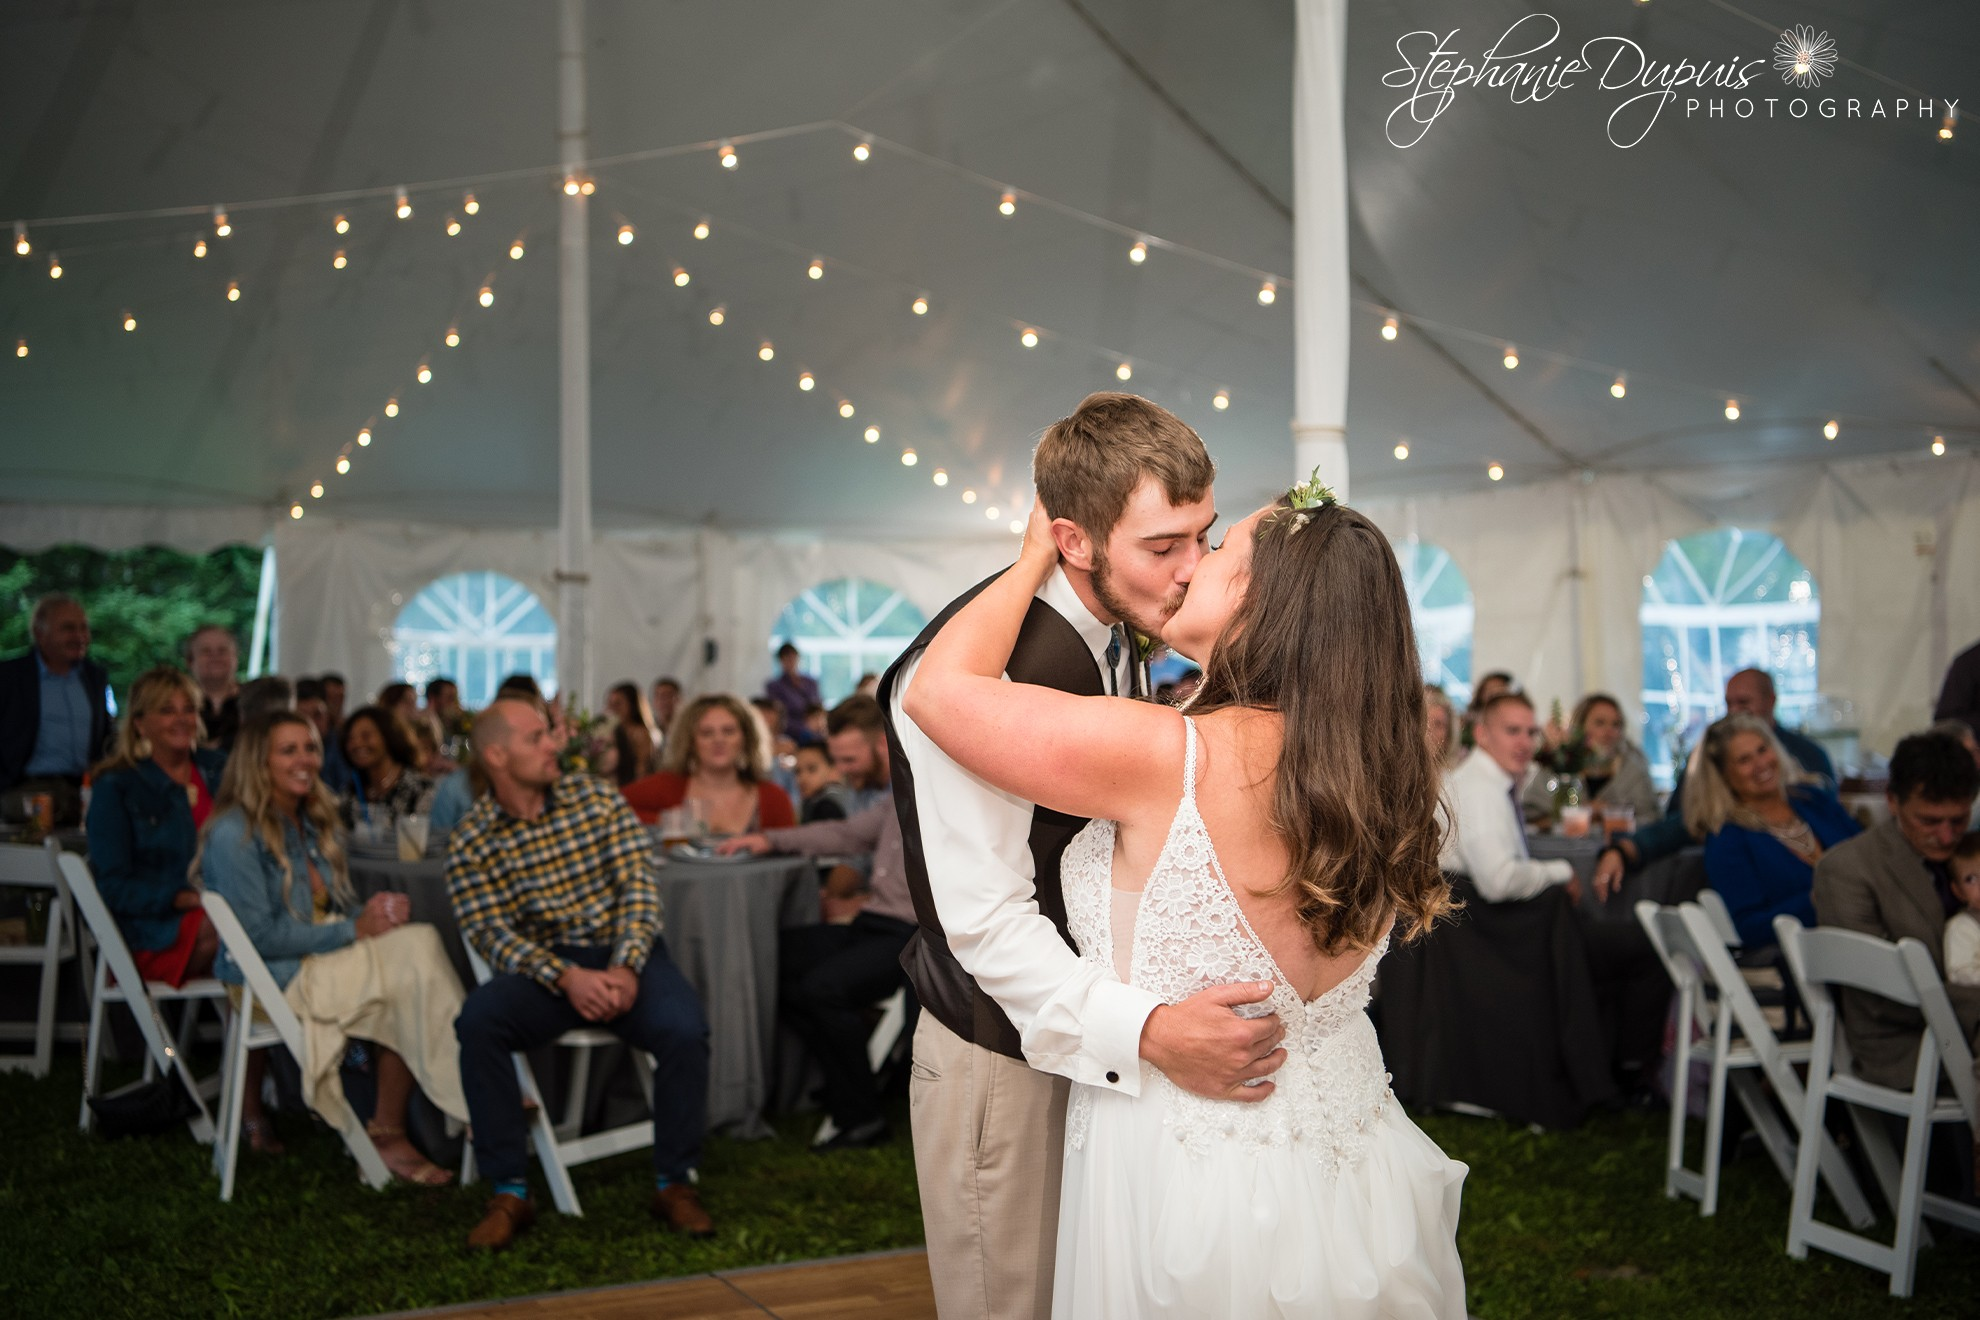 Hicks Wedding 13 - Portfolio: Hick's Wedding